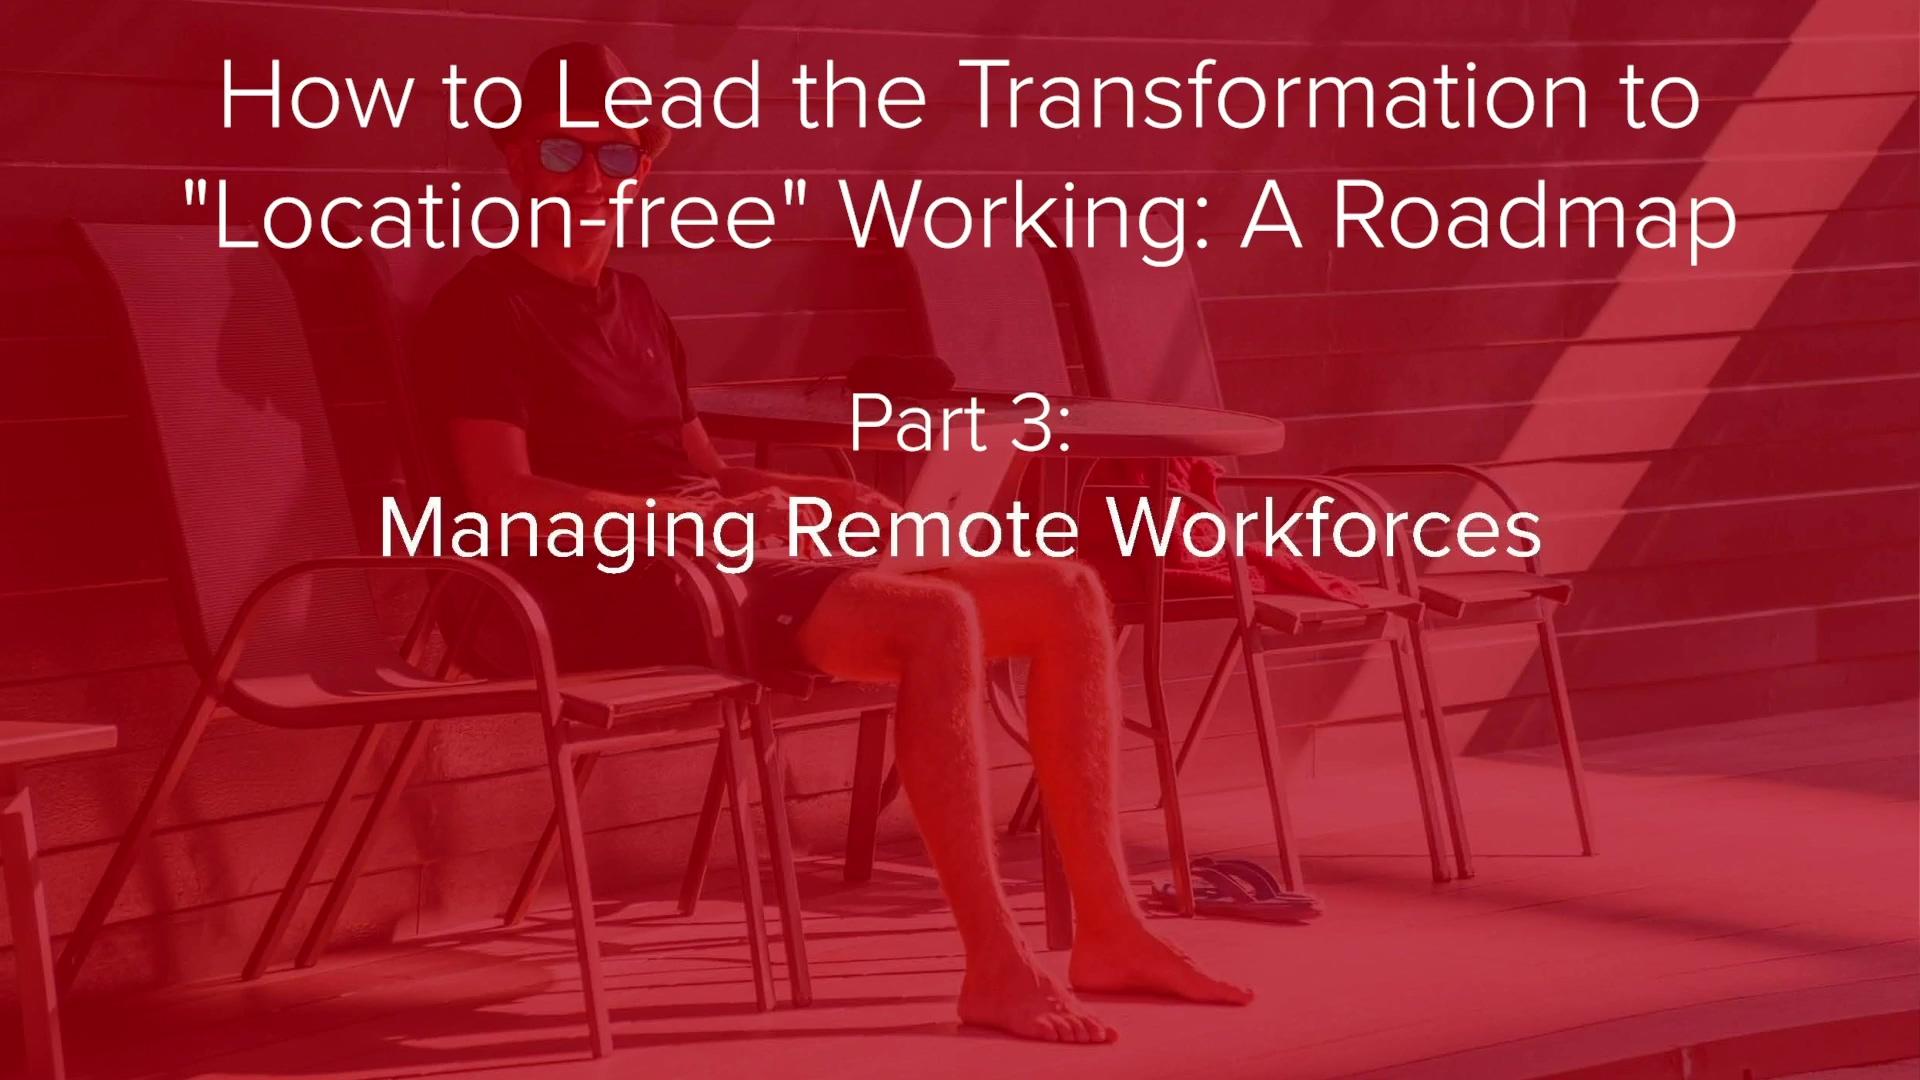 Enabling Location-freeworking - Part 3 - Managingremote Workforce (compressed)